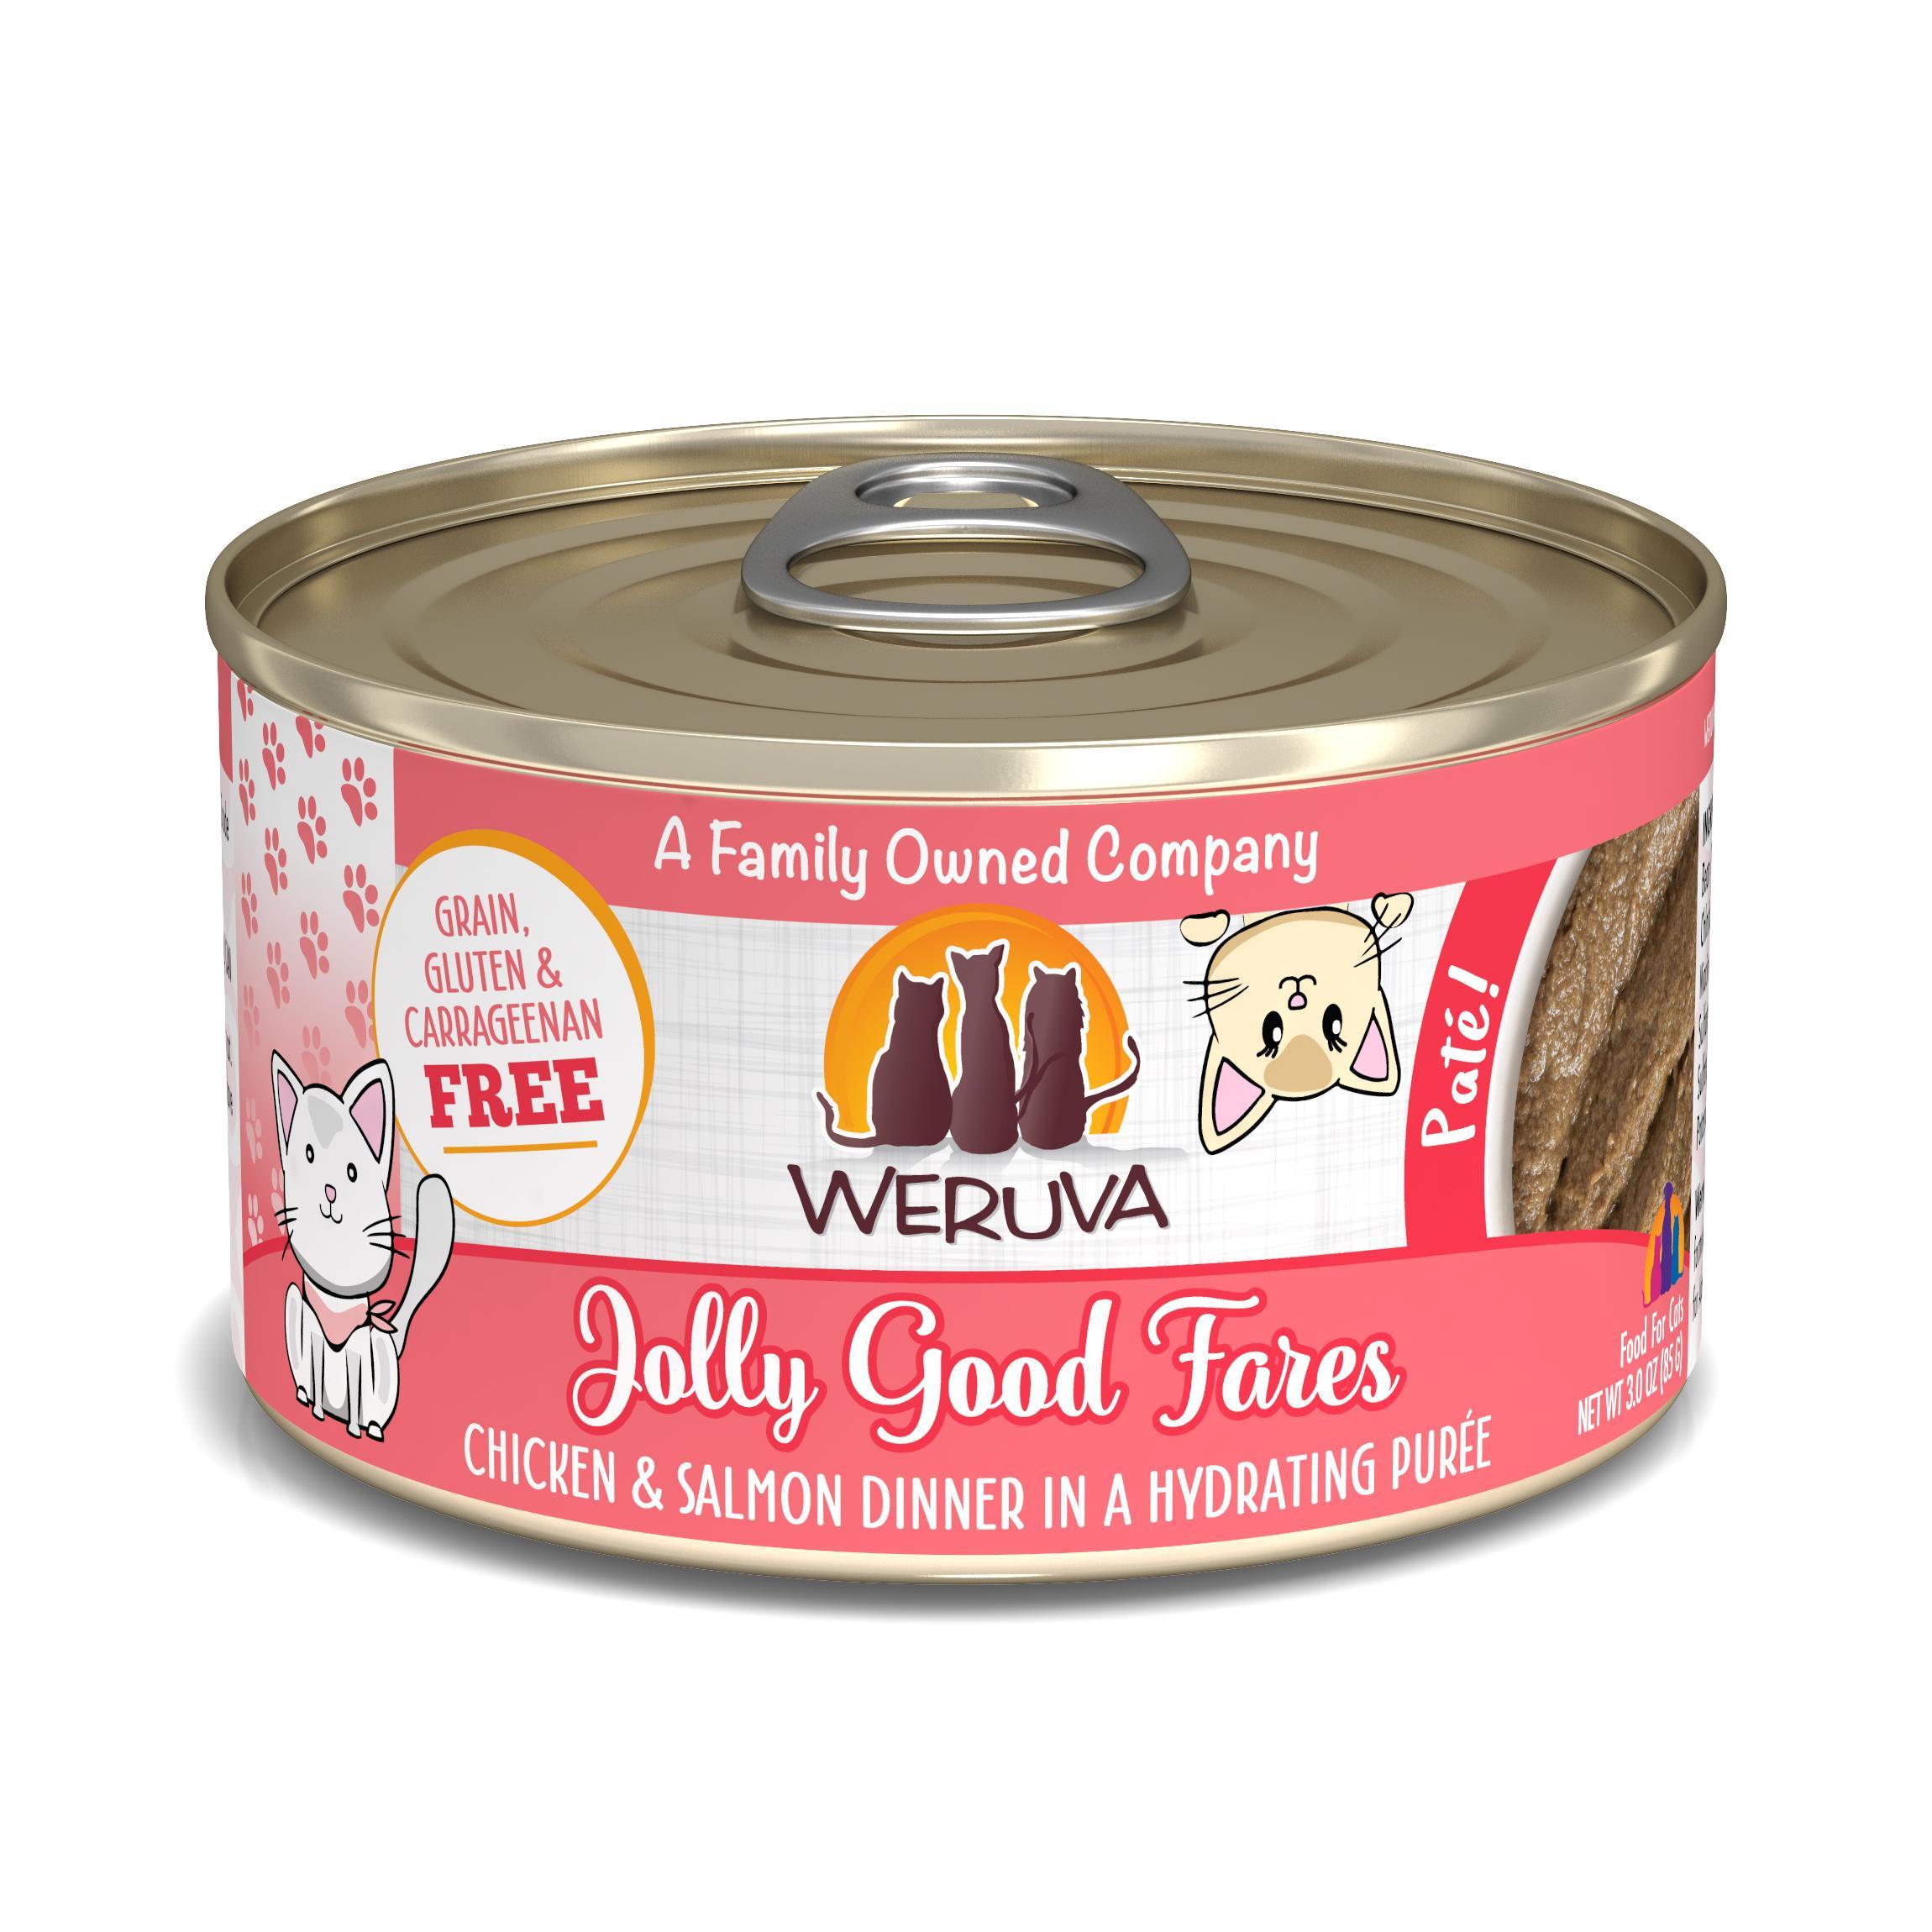 Weruva Cat Pate Jolly Good Fares Chicken & Salmon Dinner in Puree Wet Cat Food Image